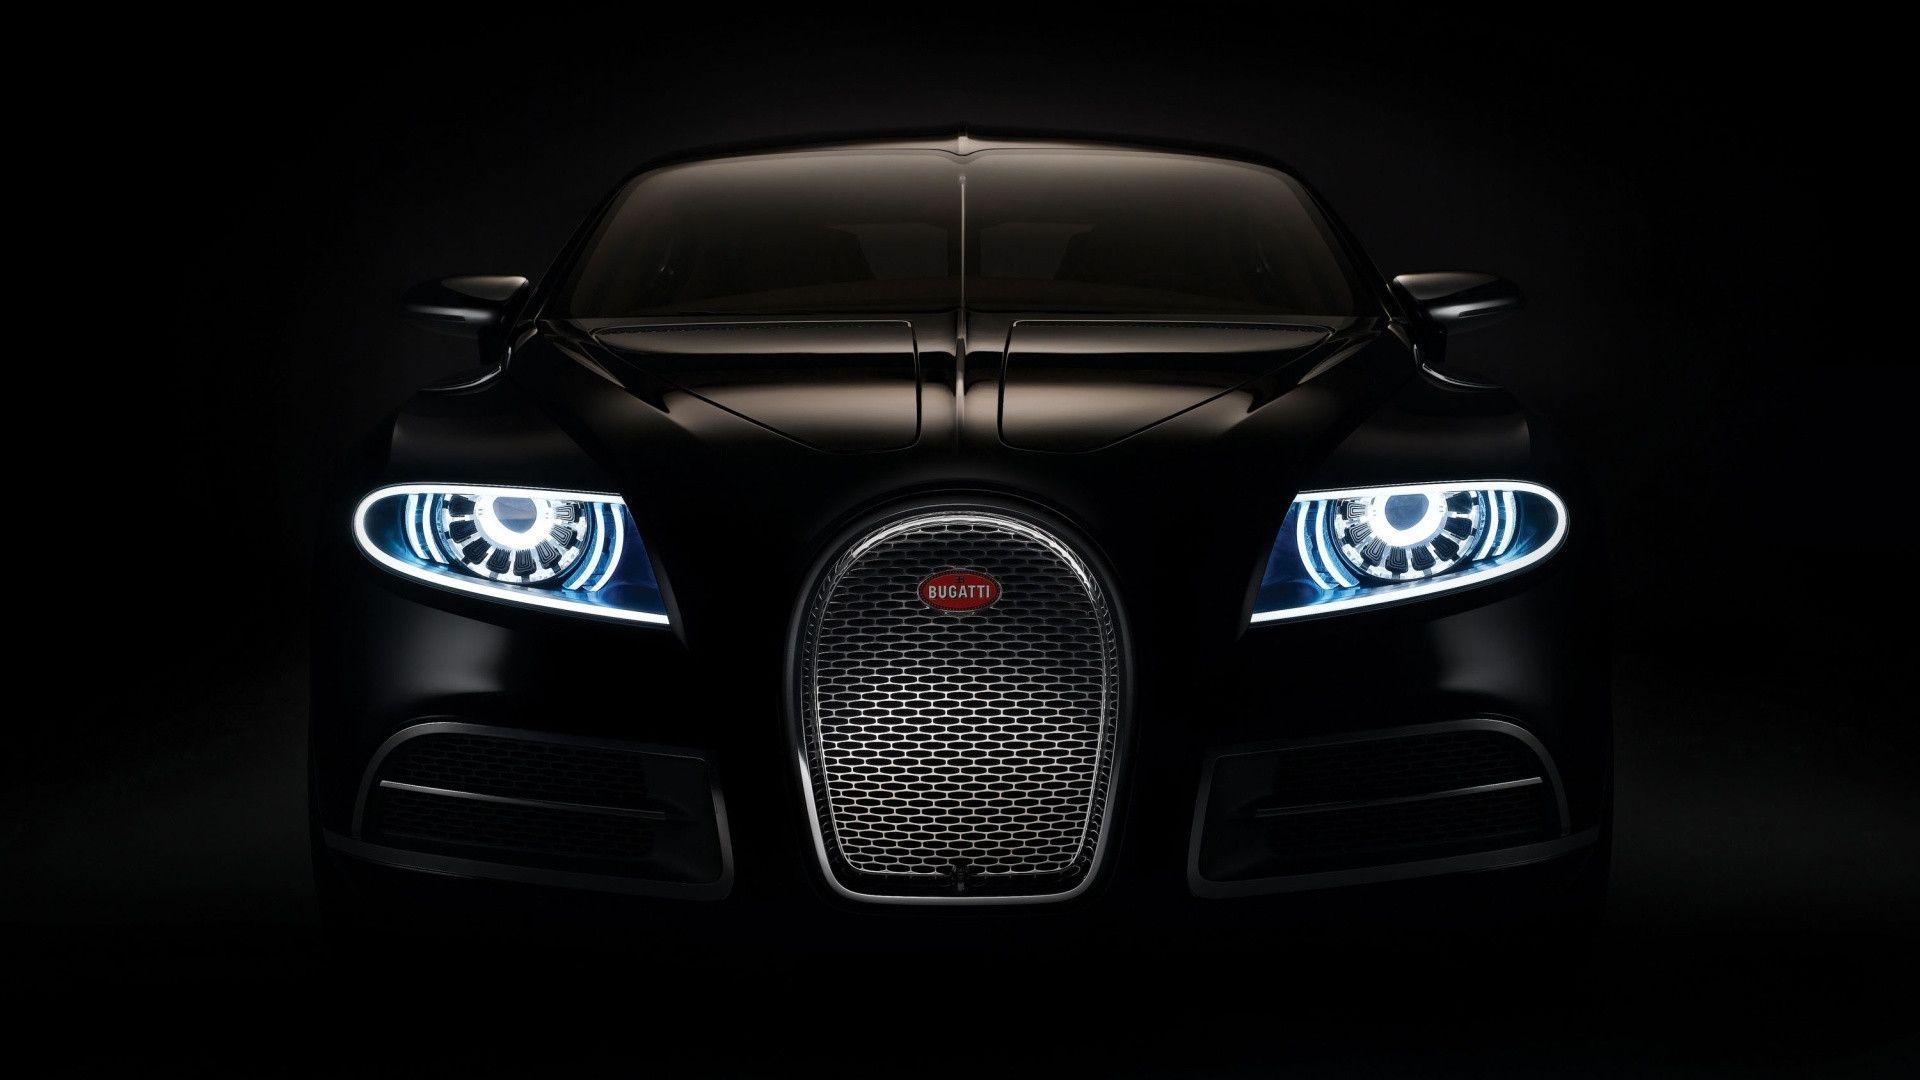 Bugatti Veyron Wallpapers Hd Sports Car Wallpaper Bugatti Cars Super Sport Cars